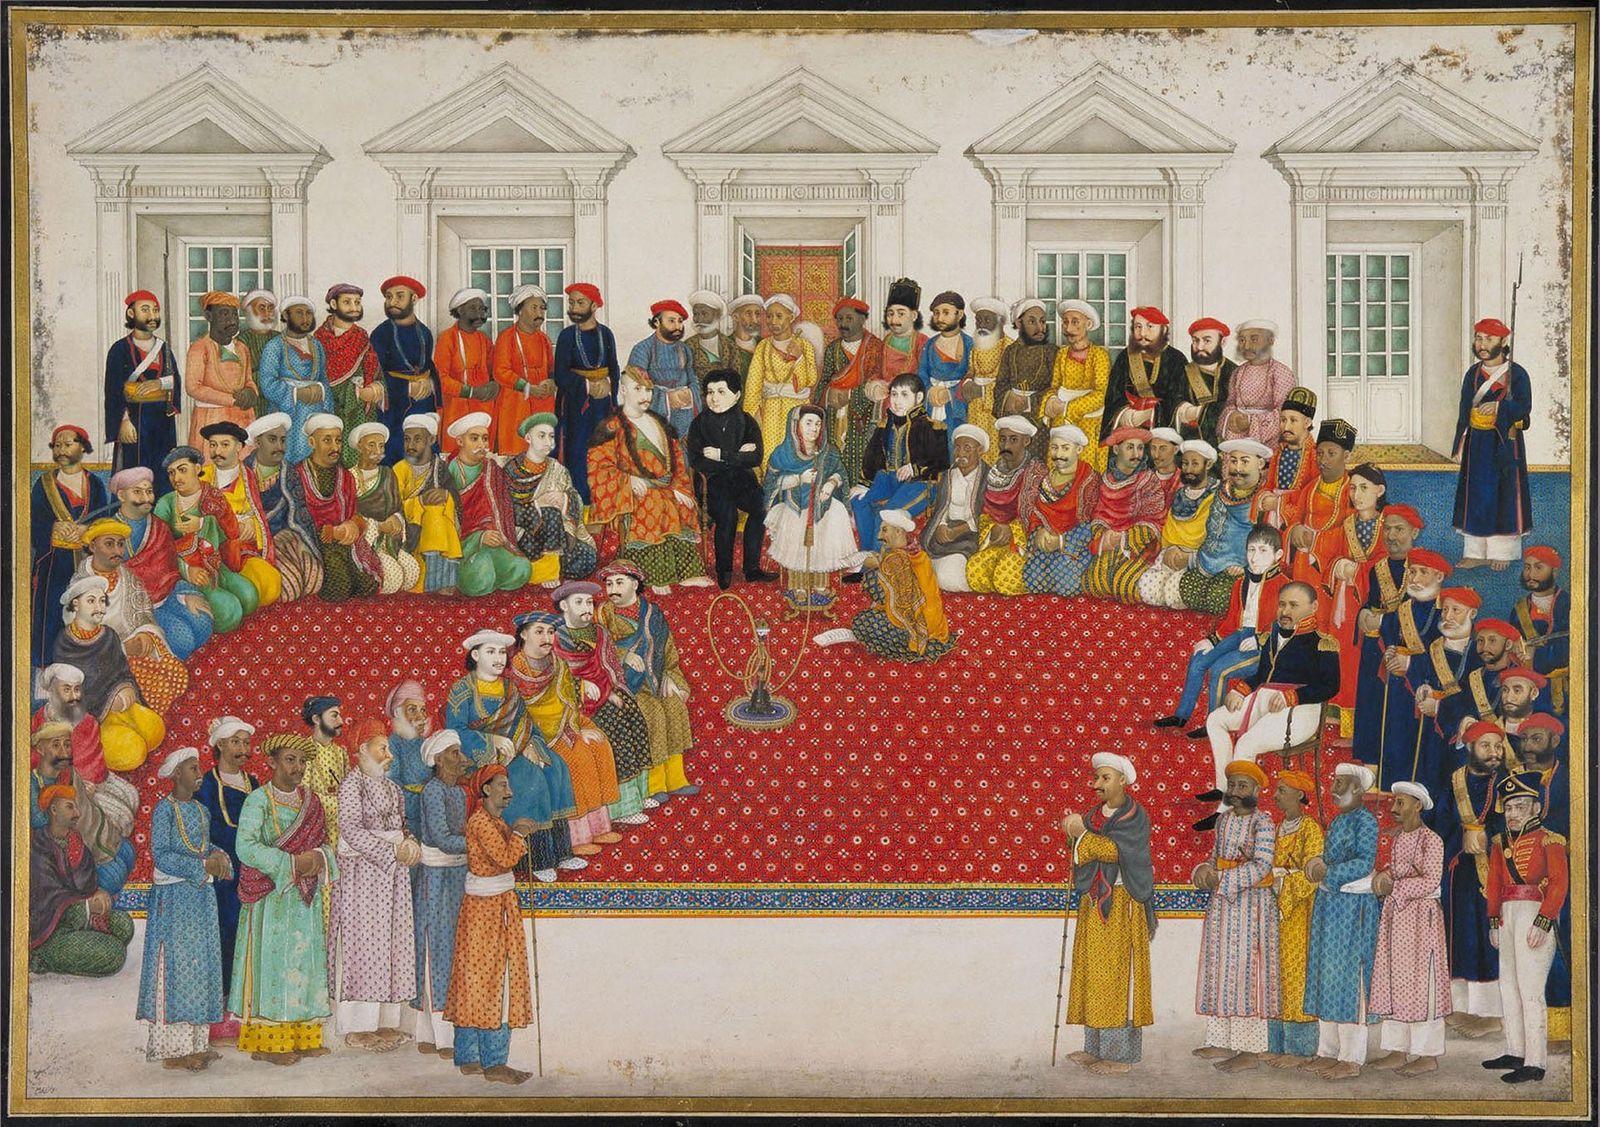 Esta pintura de Begum Samru e dos seus seguidores foi feita por volta de 1830. A ...